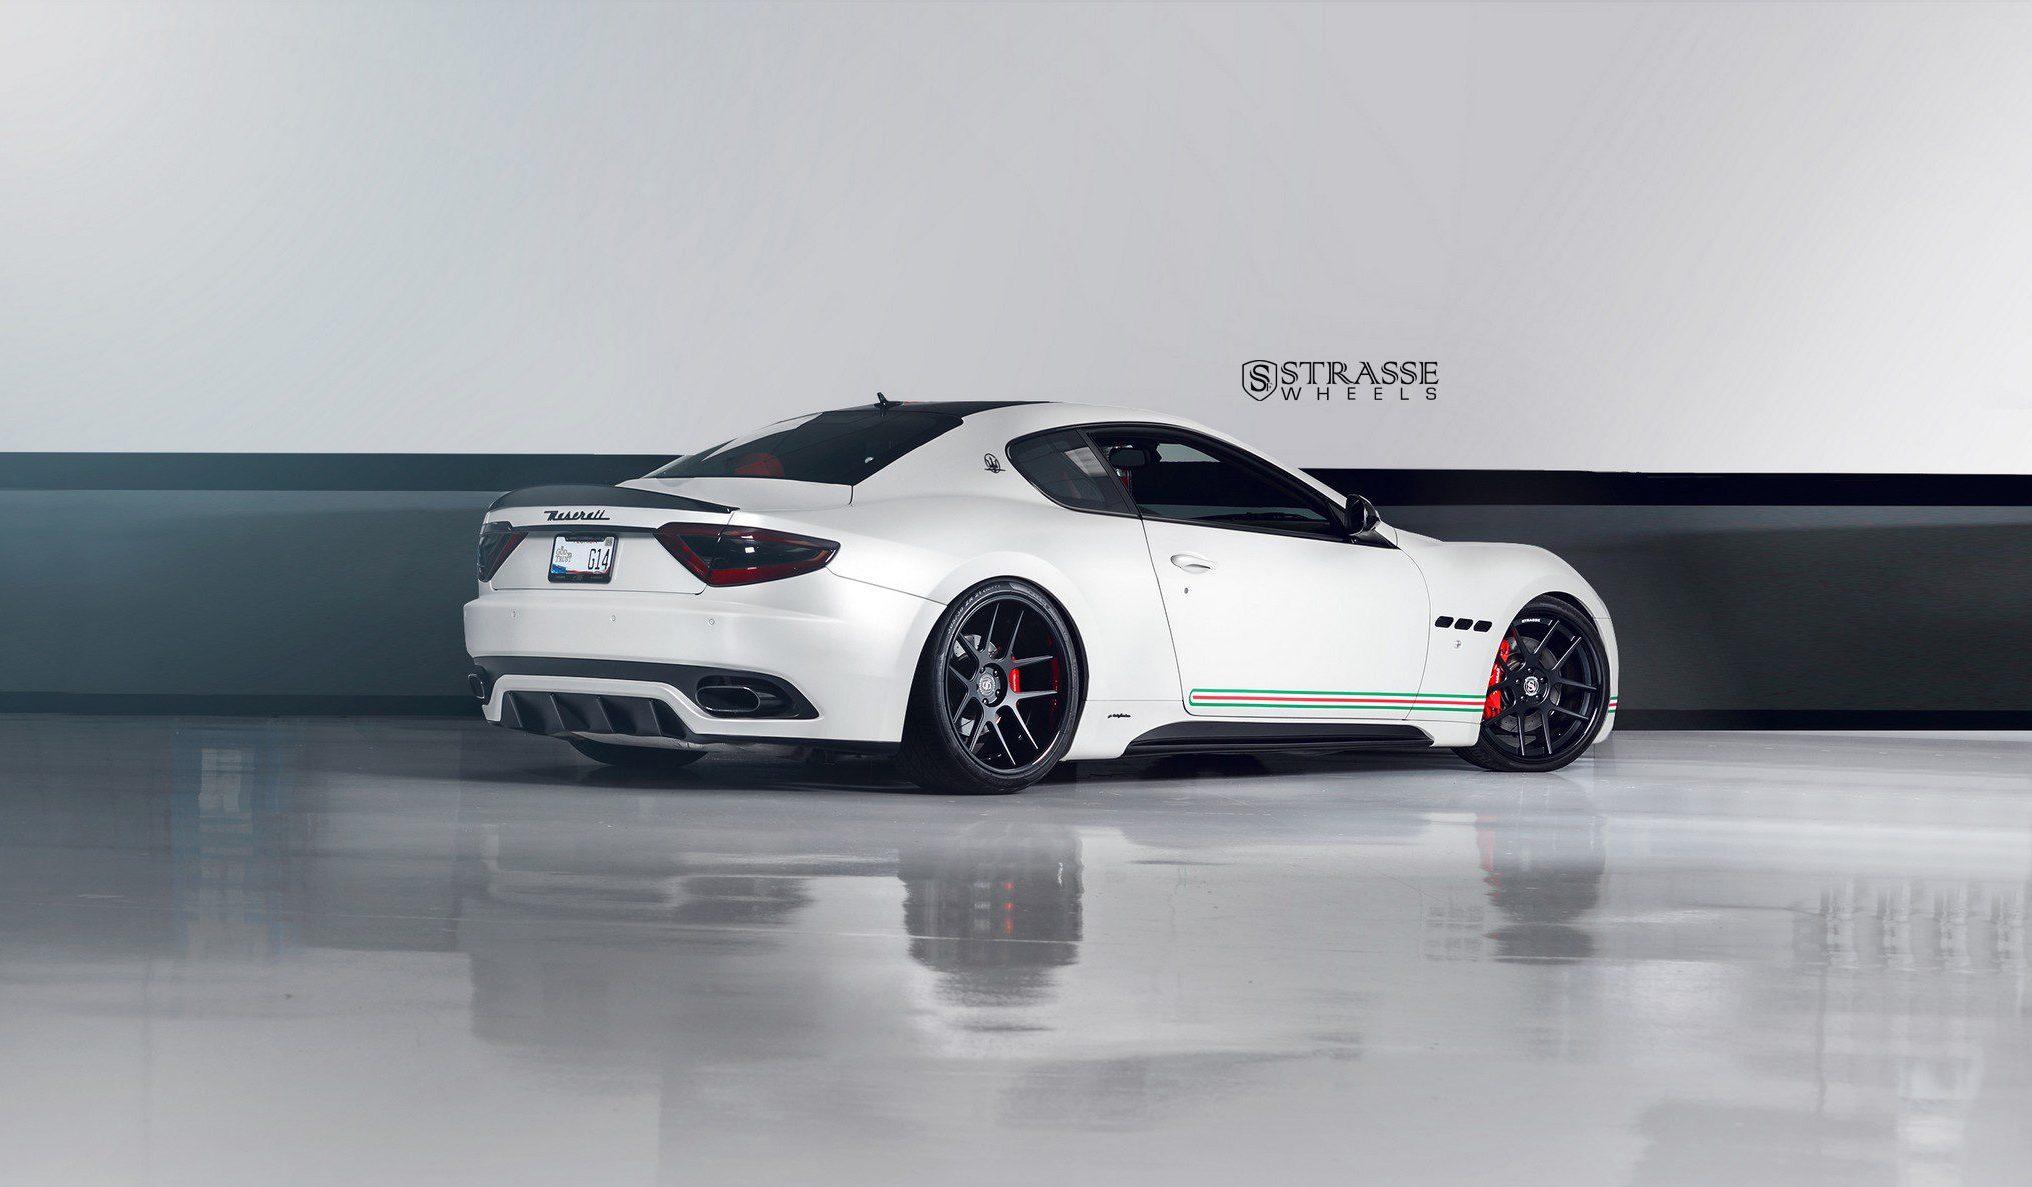 Maserati Gran Turismo S Strasse Wheels High